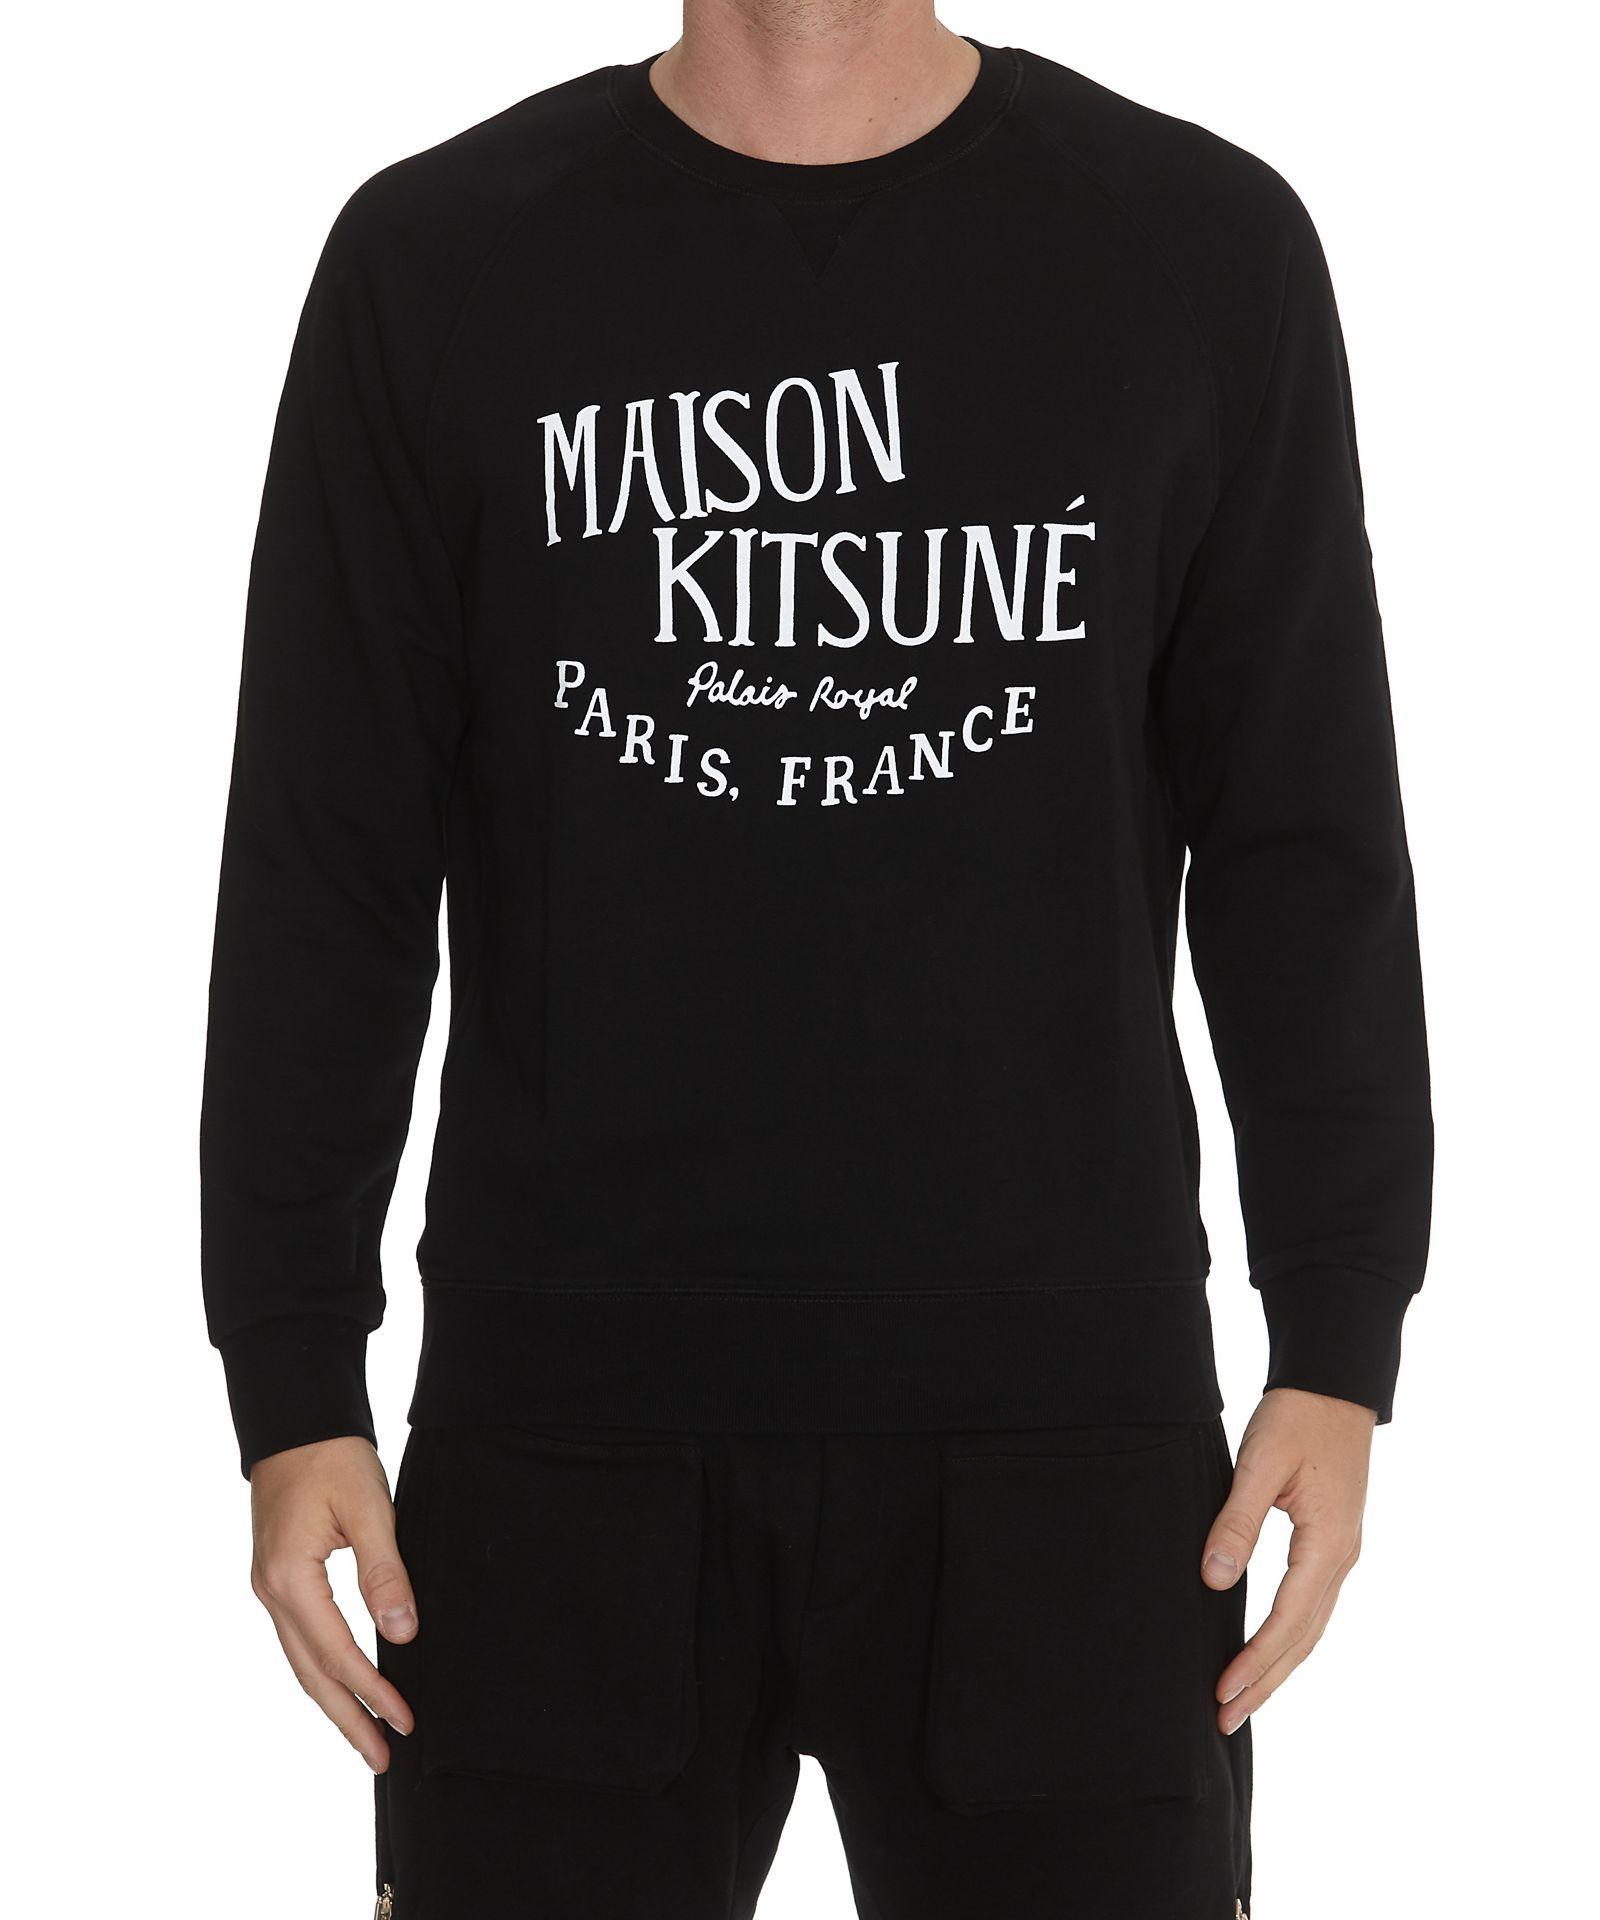 Maison Kitsune Palais Royal Sweatshirt Maisonkitsune Cloth [ 1920 x 1600 Pixel ]